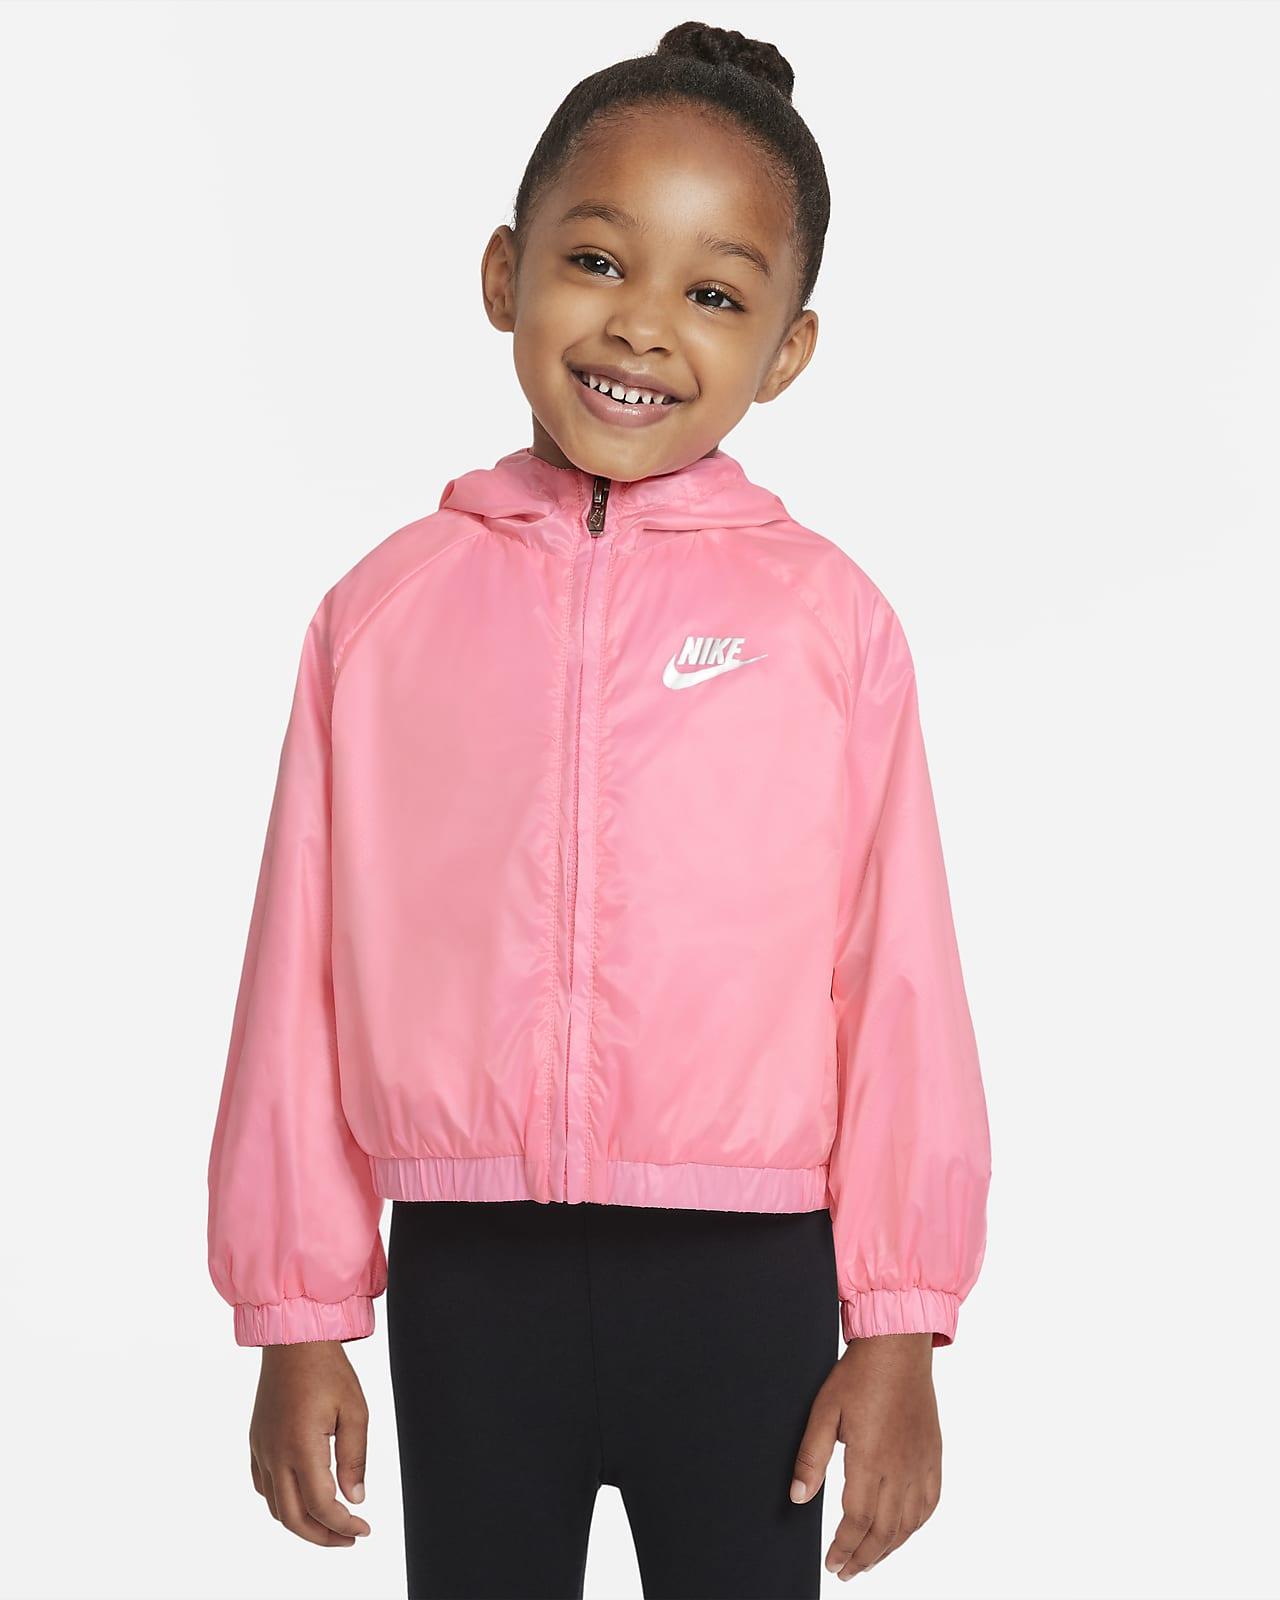 Nike Sportswear 婴童全长拉链开襟夹克